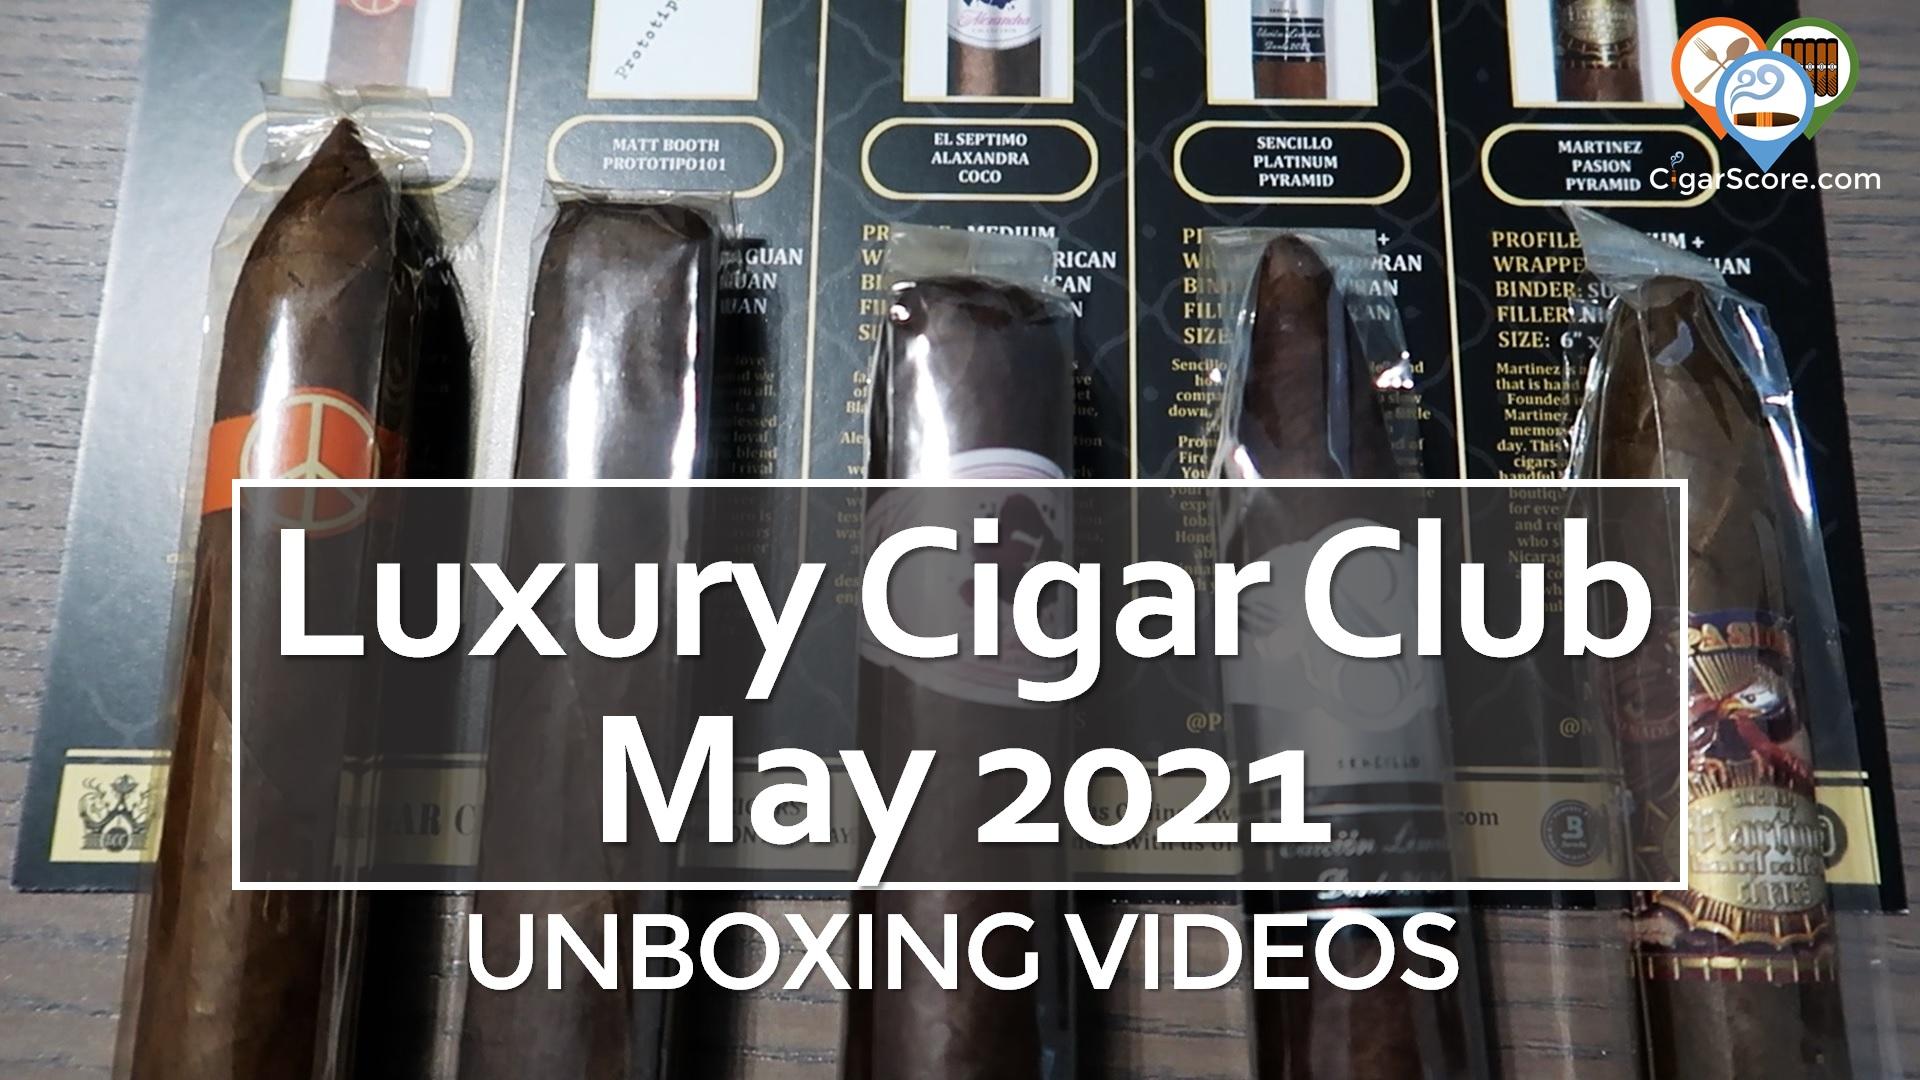 UNBOXING Luxury Cigar Club MAY 2021